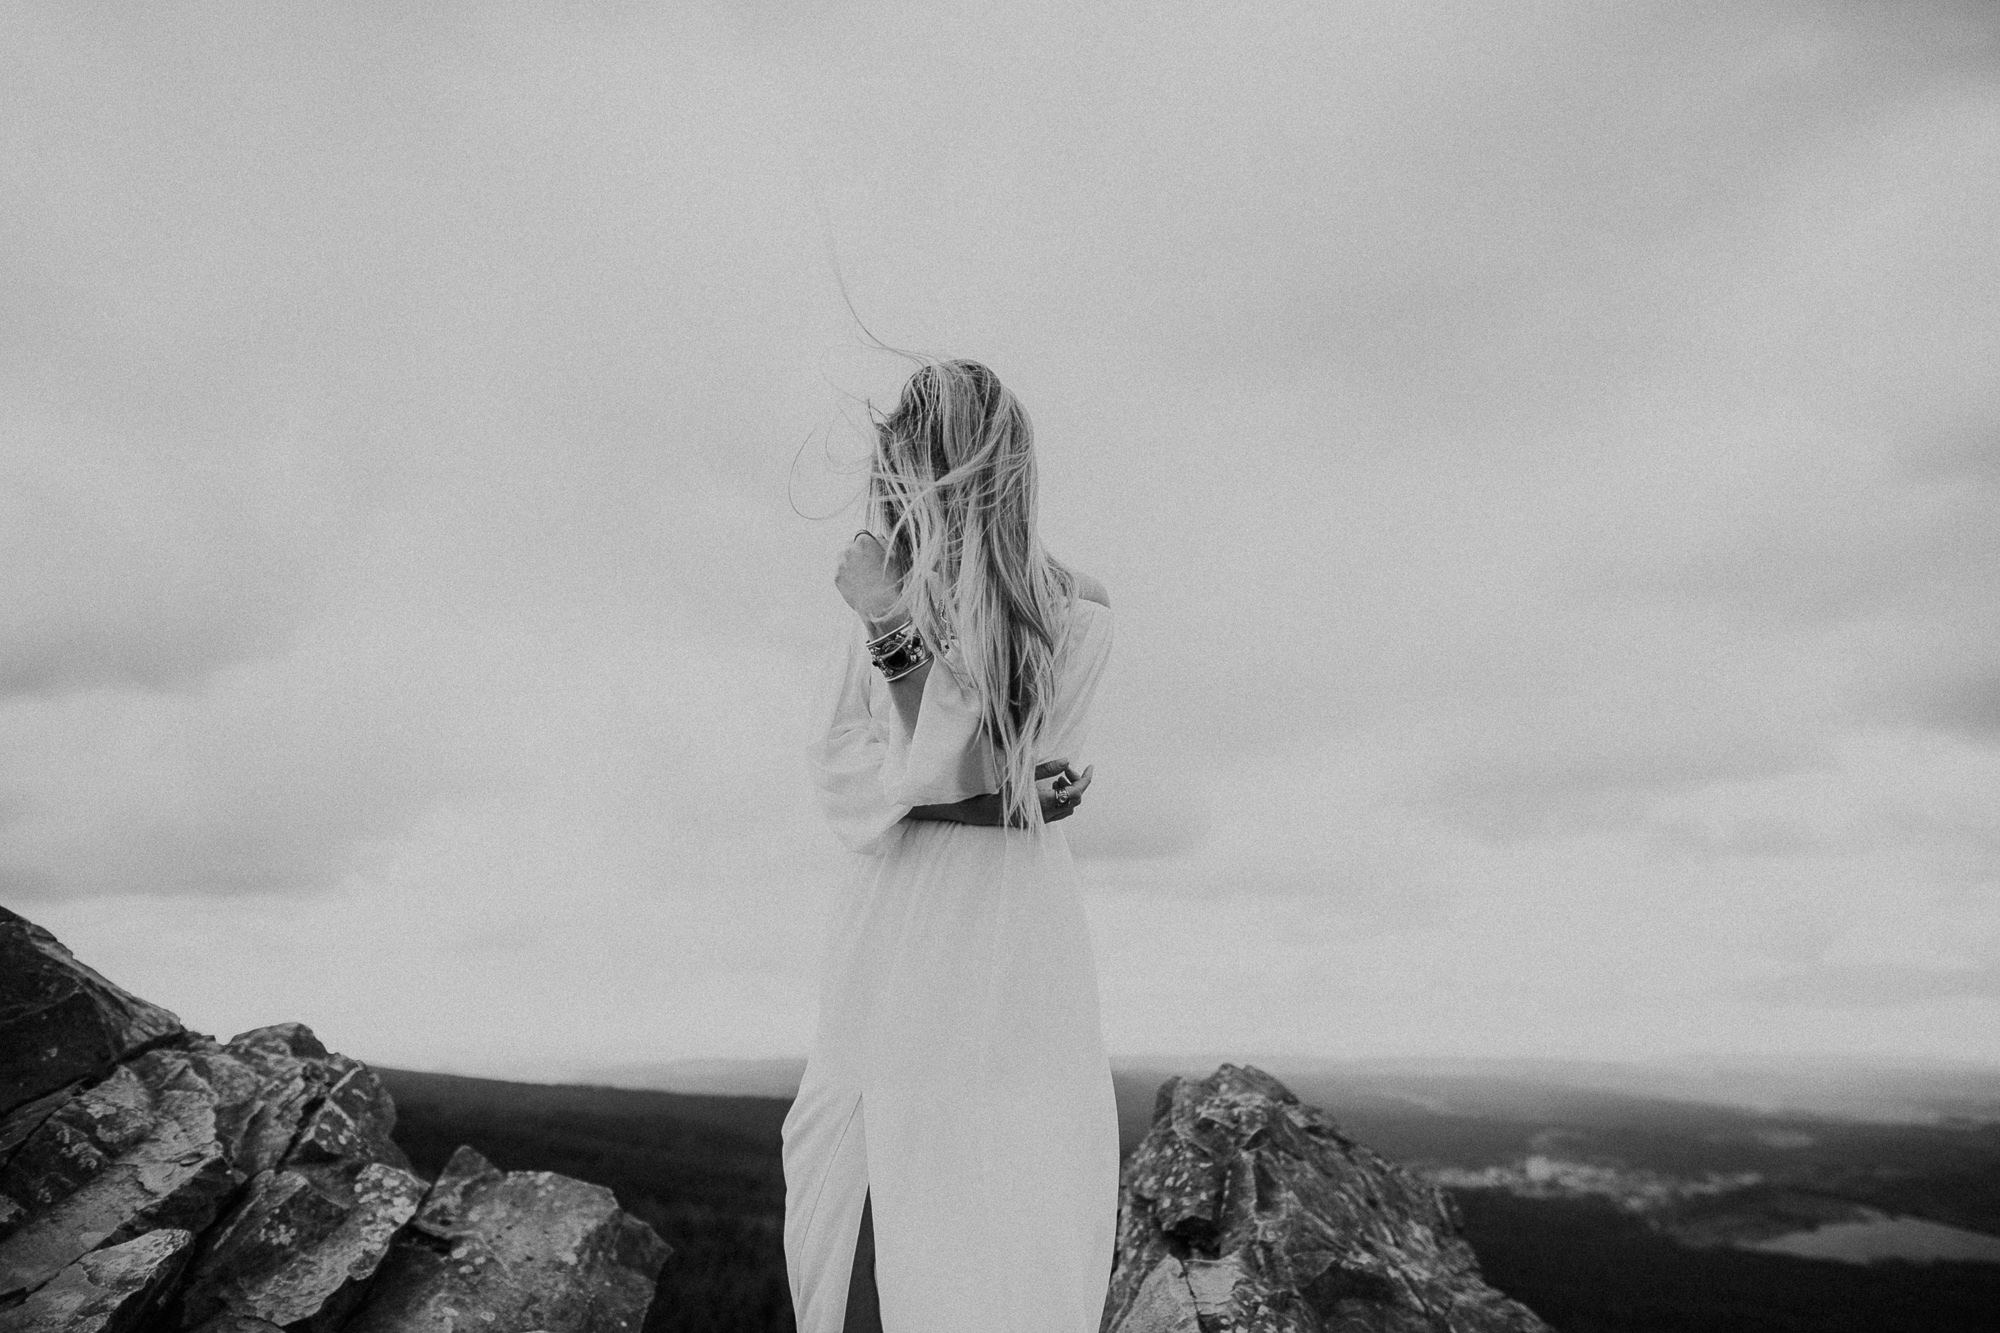 intothewild_julia_dimi_31